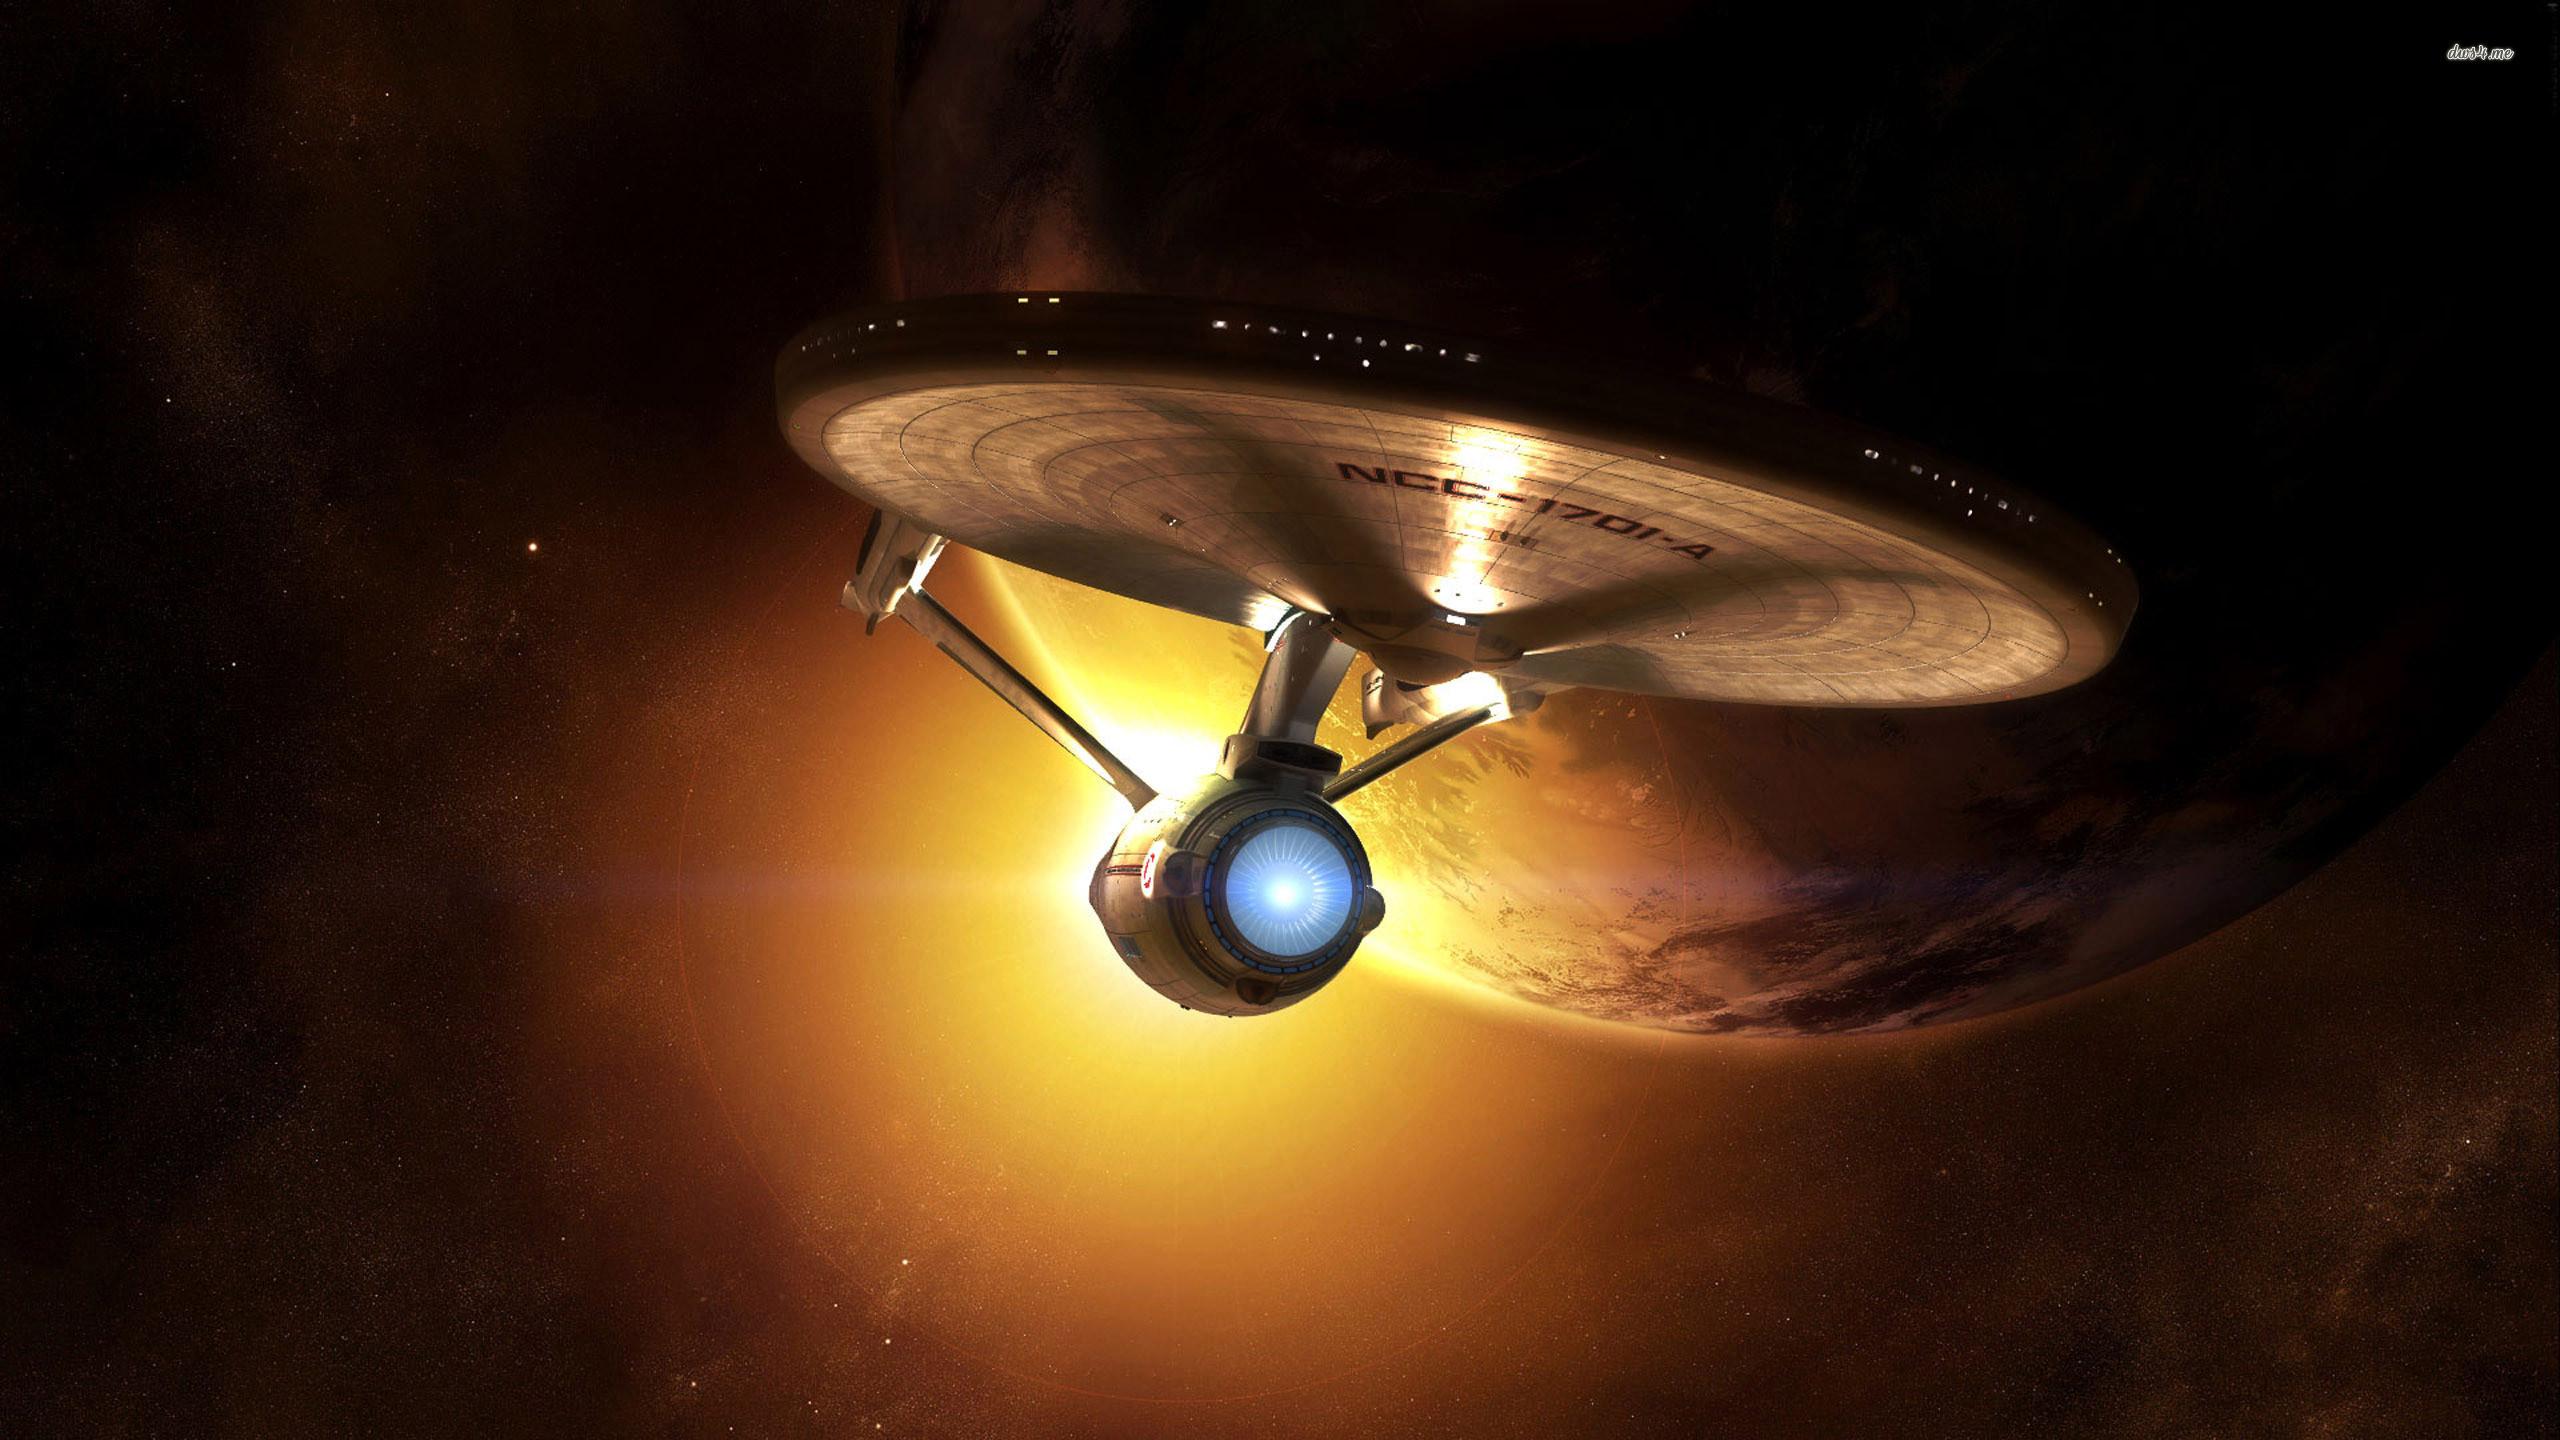 Star Trek Wallpapers Android Download